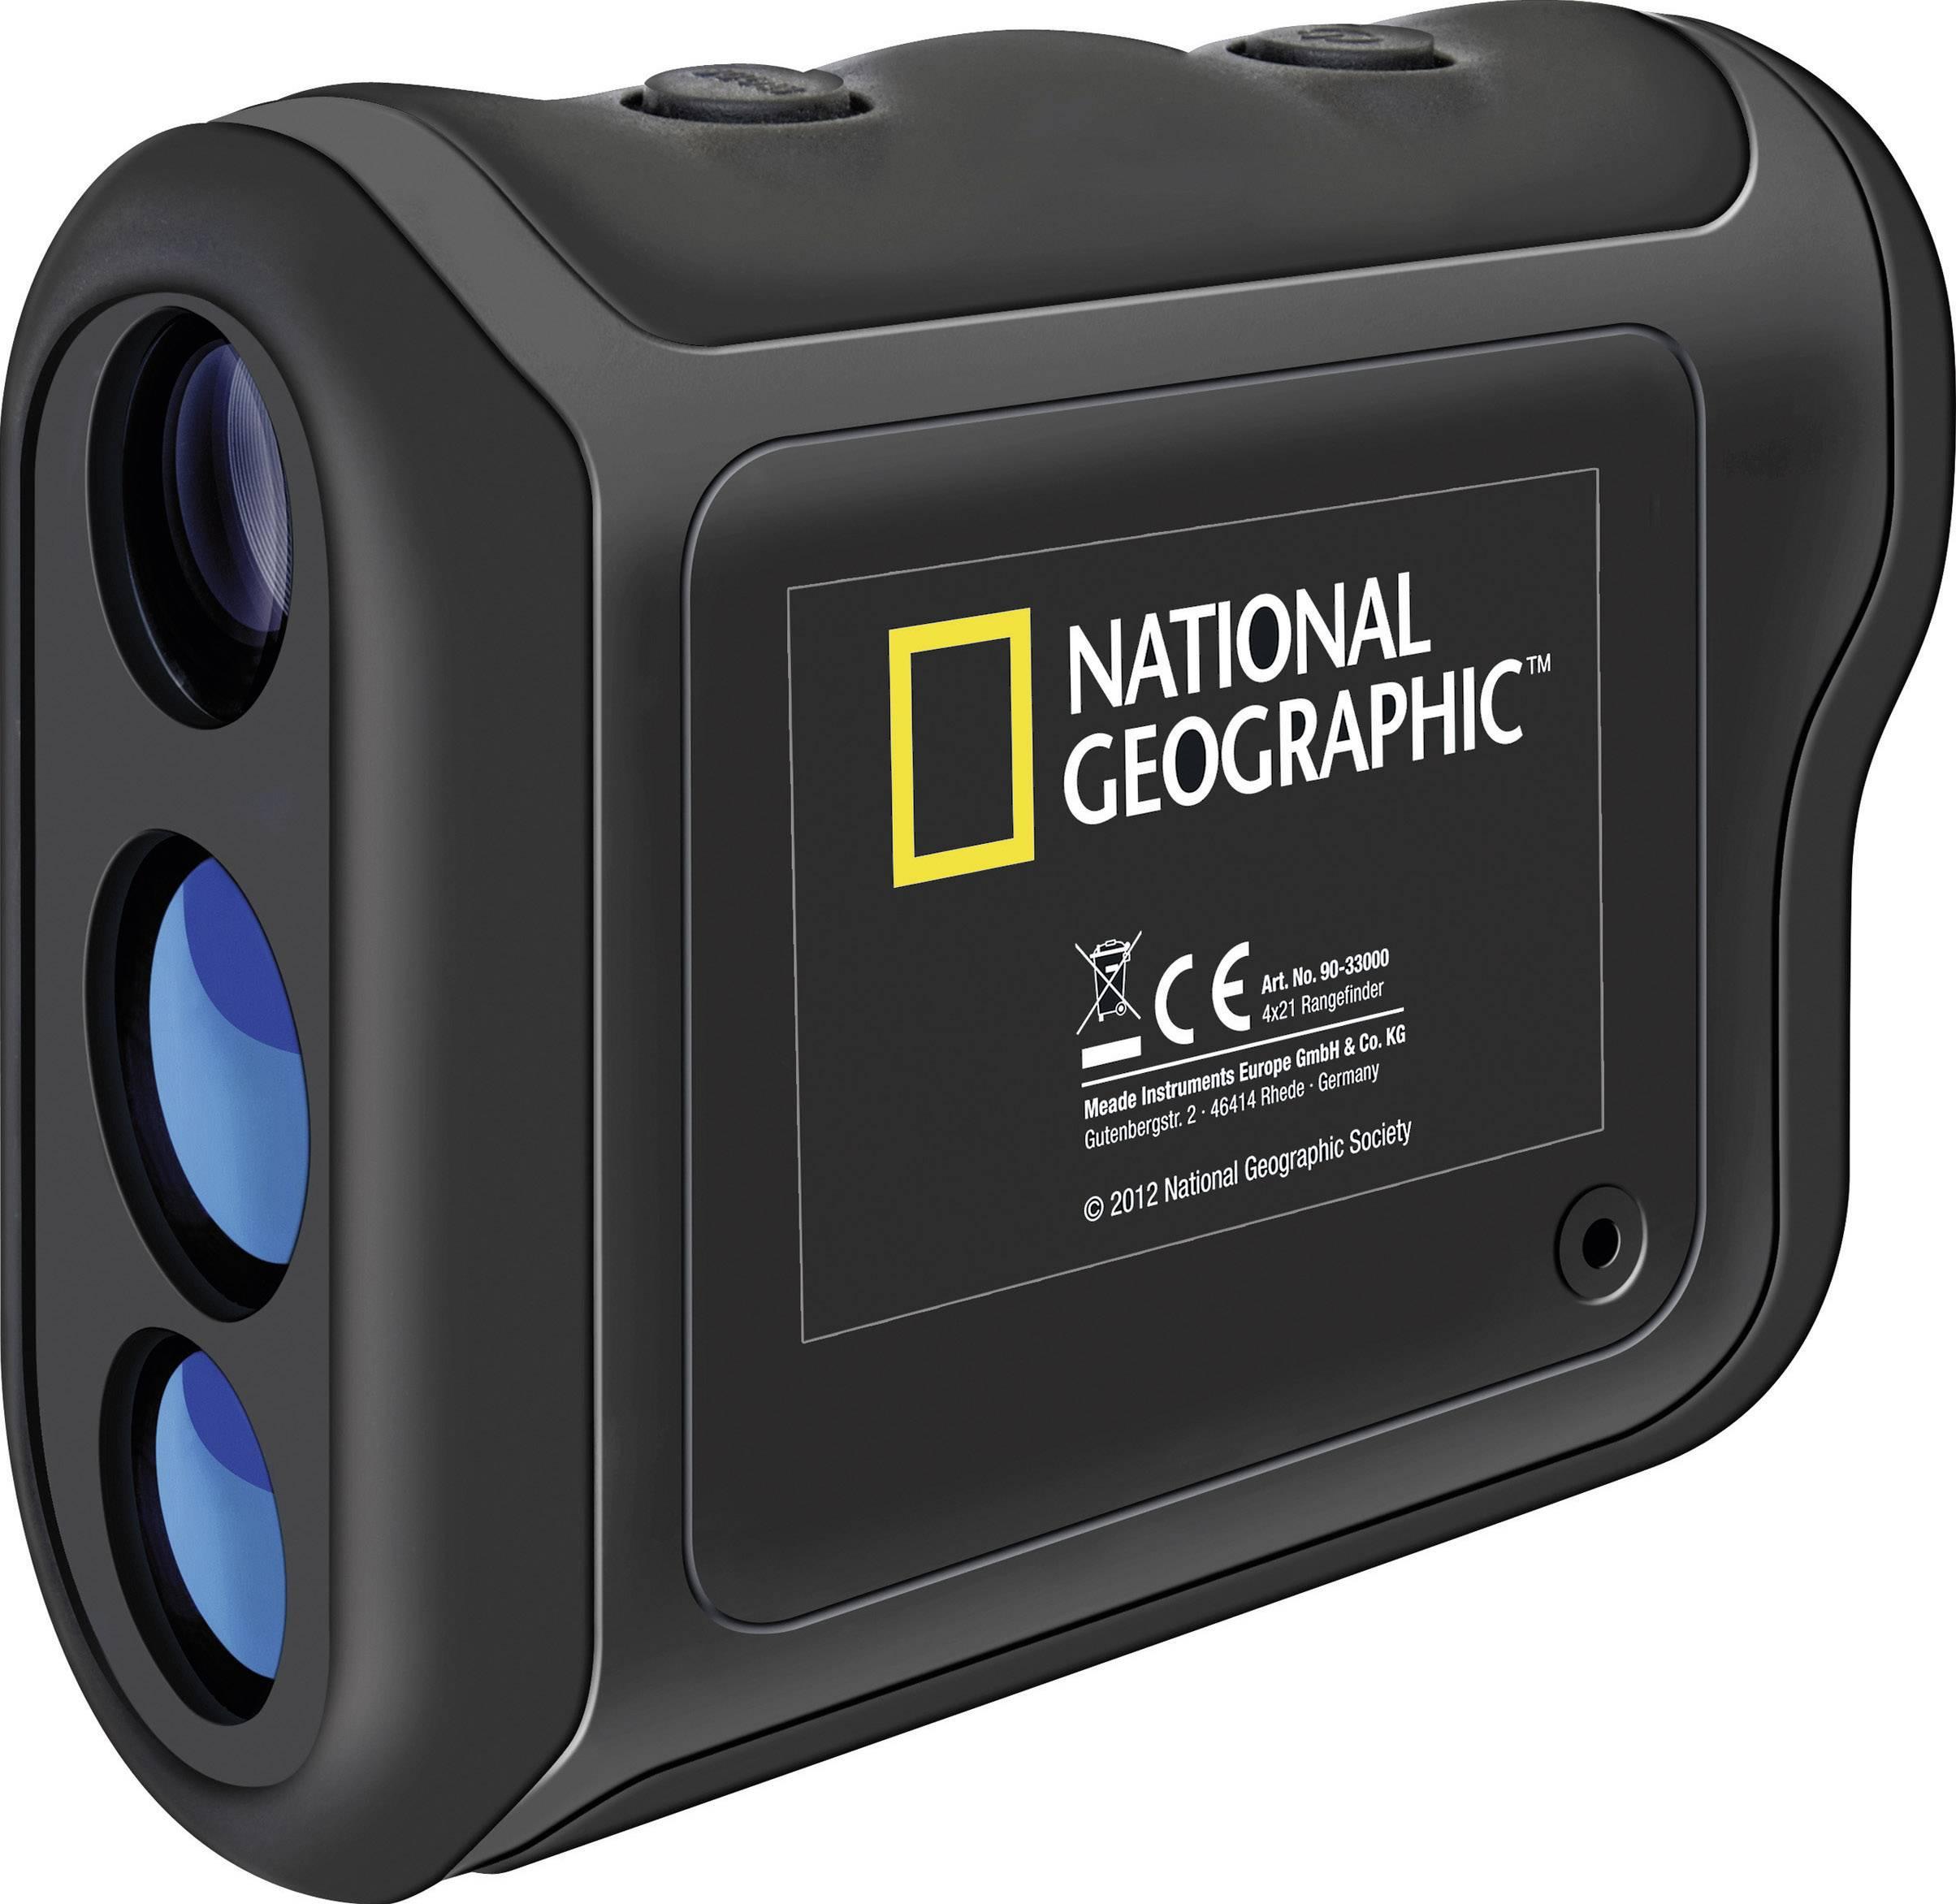 Merač vzdialenosti National Geographic 4x21 Rangefinder, 4 x 21 mm, 5 do 800 m